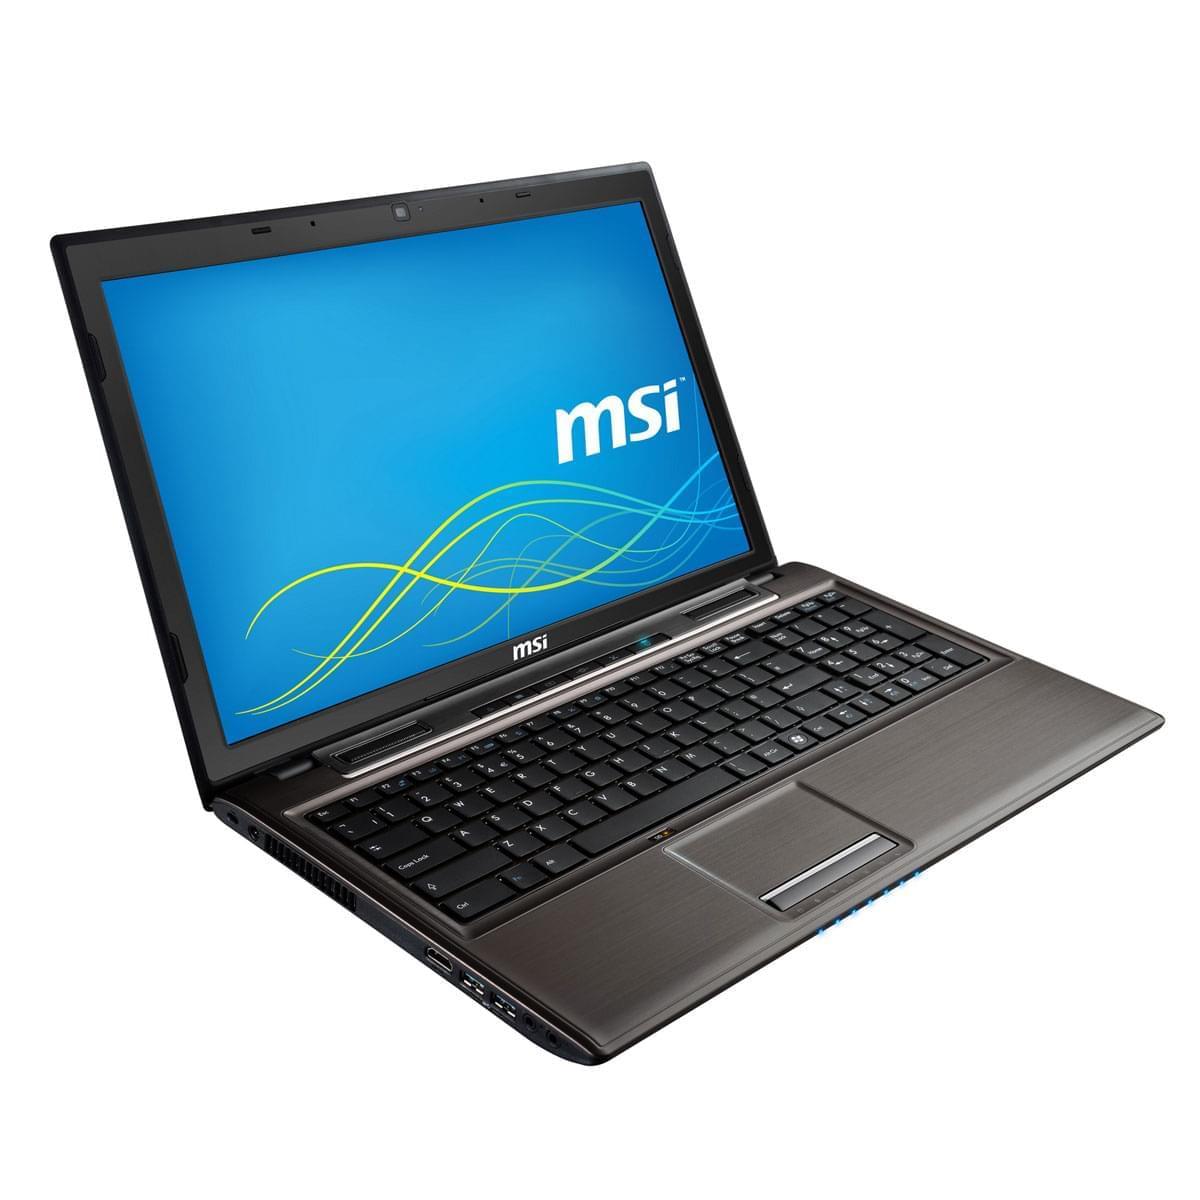 MSI CX61 0NC-057FR (9S7-16GB11-057) - Achat / Vente PC portable sur Cybertek.fr - 0